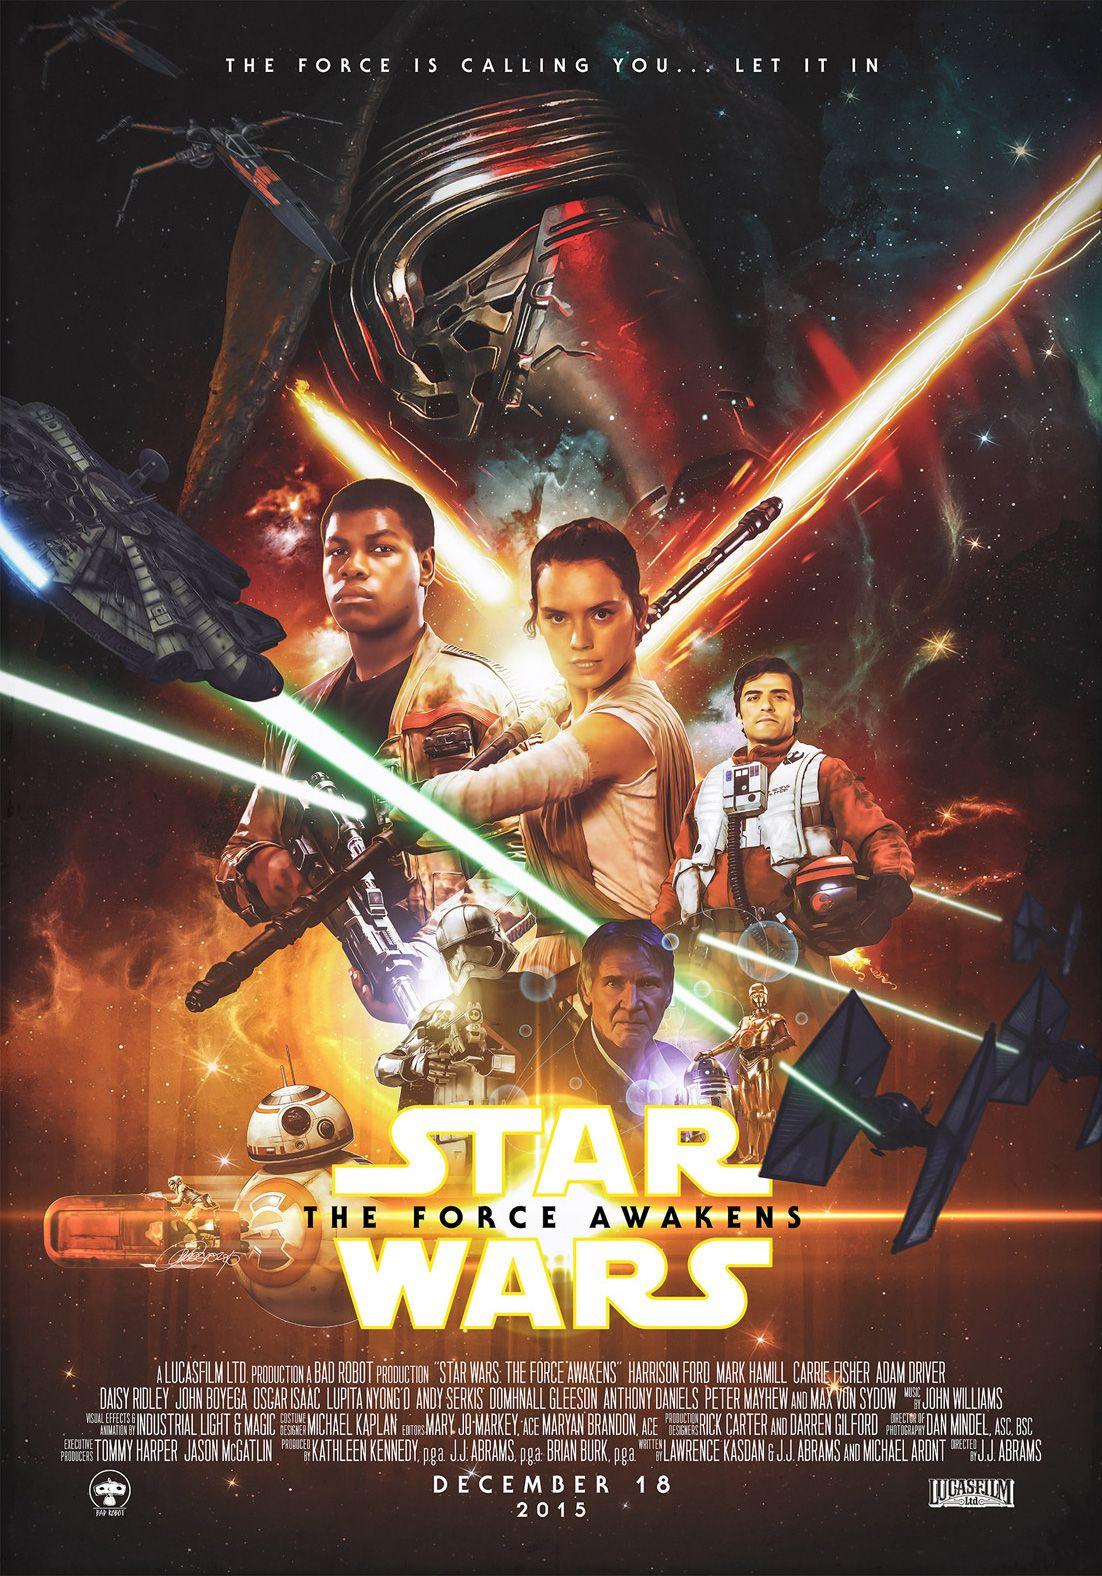 Star Wars The Force Awakens Force Awakens Poster Star Wars Poster Star Wars Episode Vii